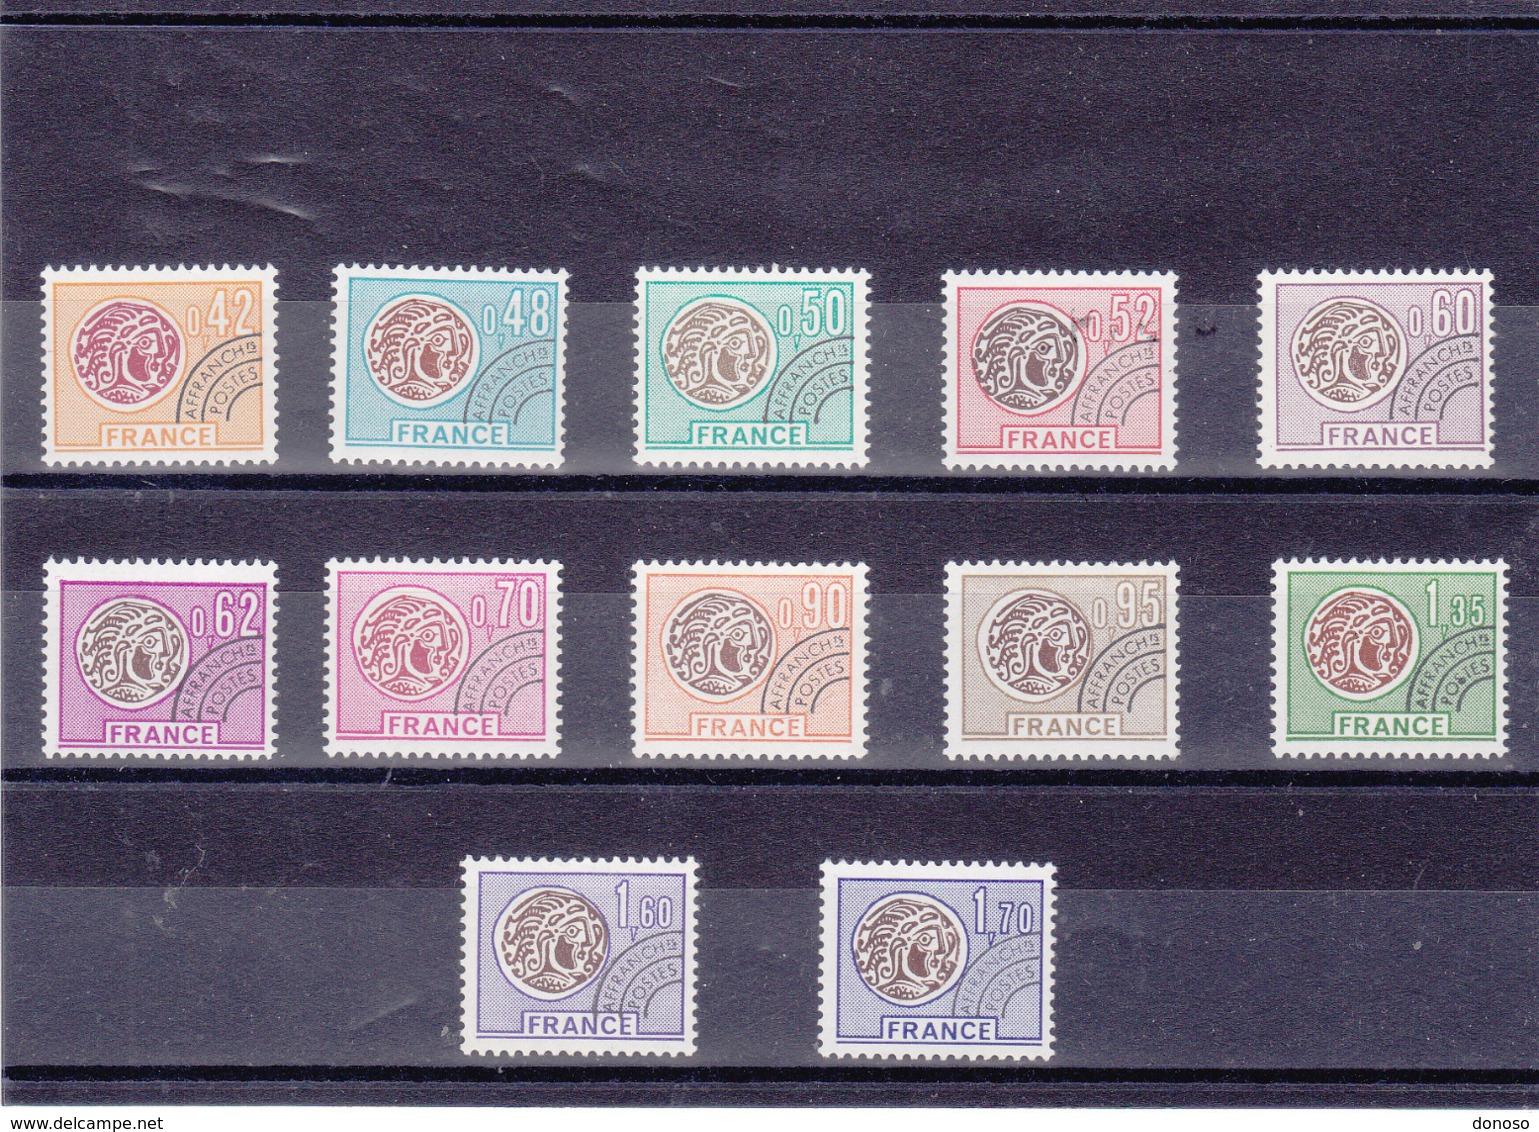 FRANCE 1975-1976 Préoblitérés Yvert 134-145 NEUFS** MNH Cote : 22 Euros - Vorausentwertungen